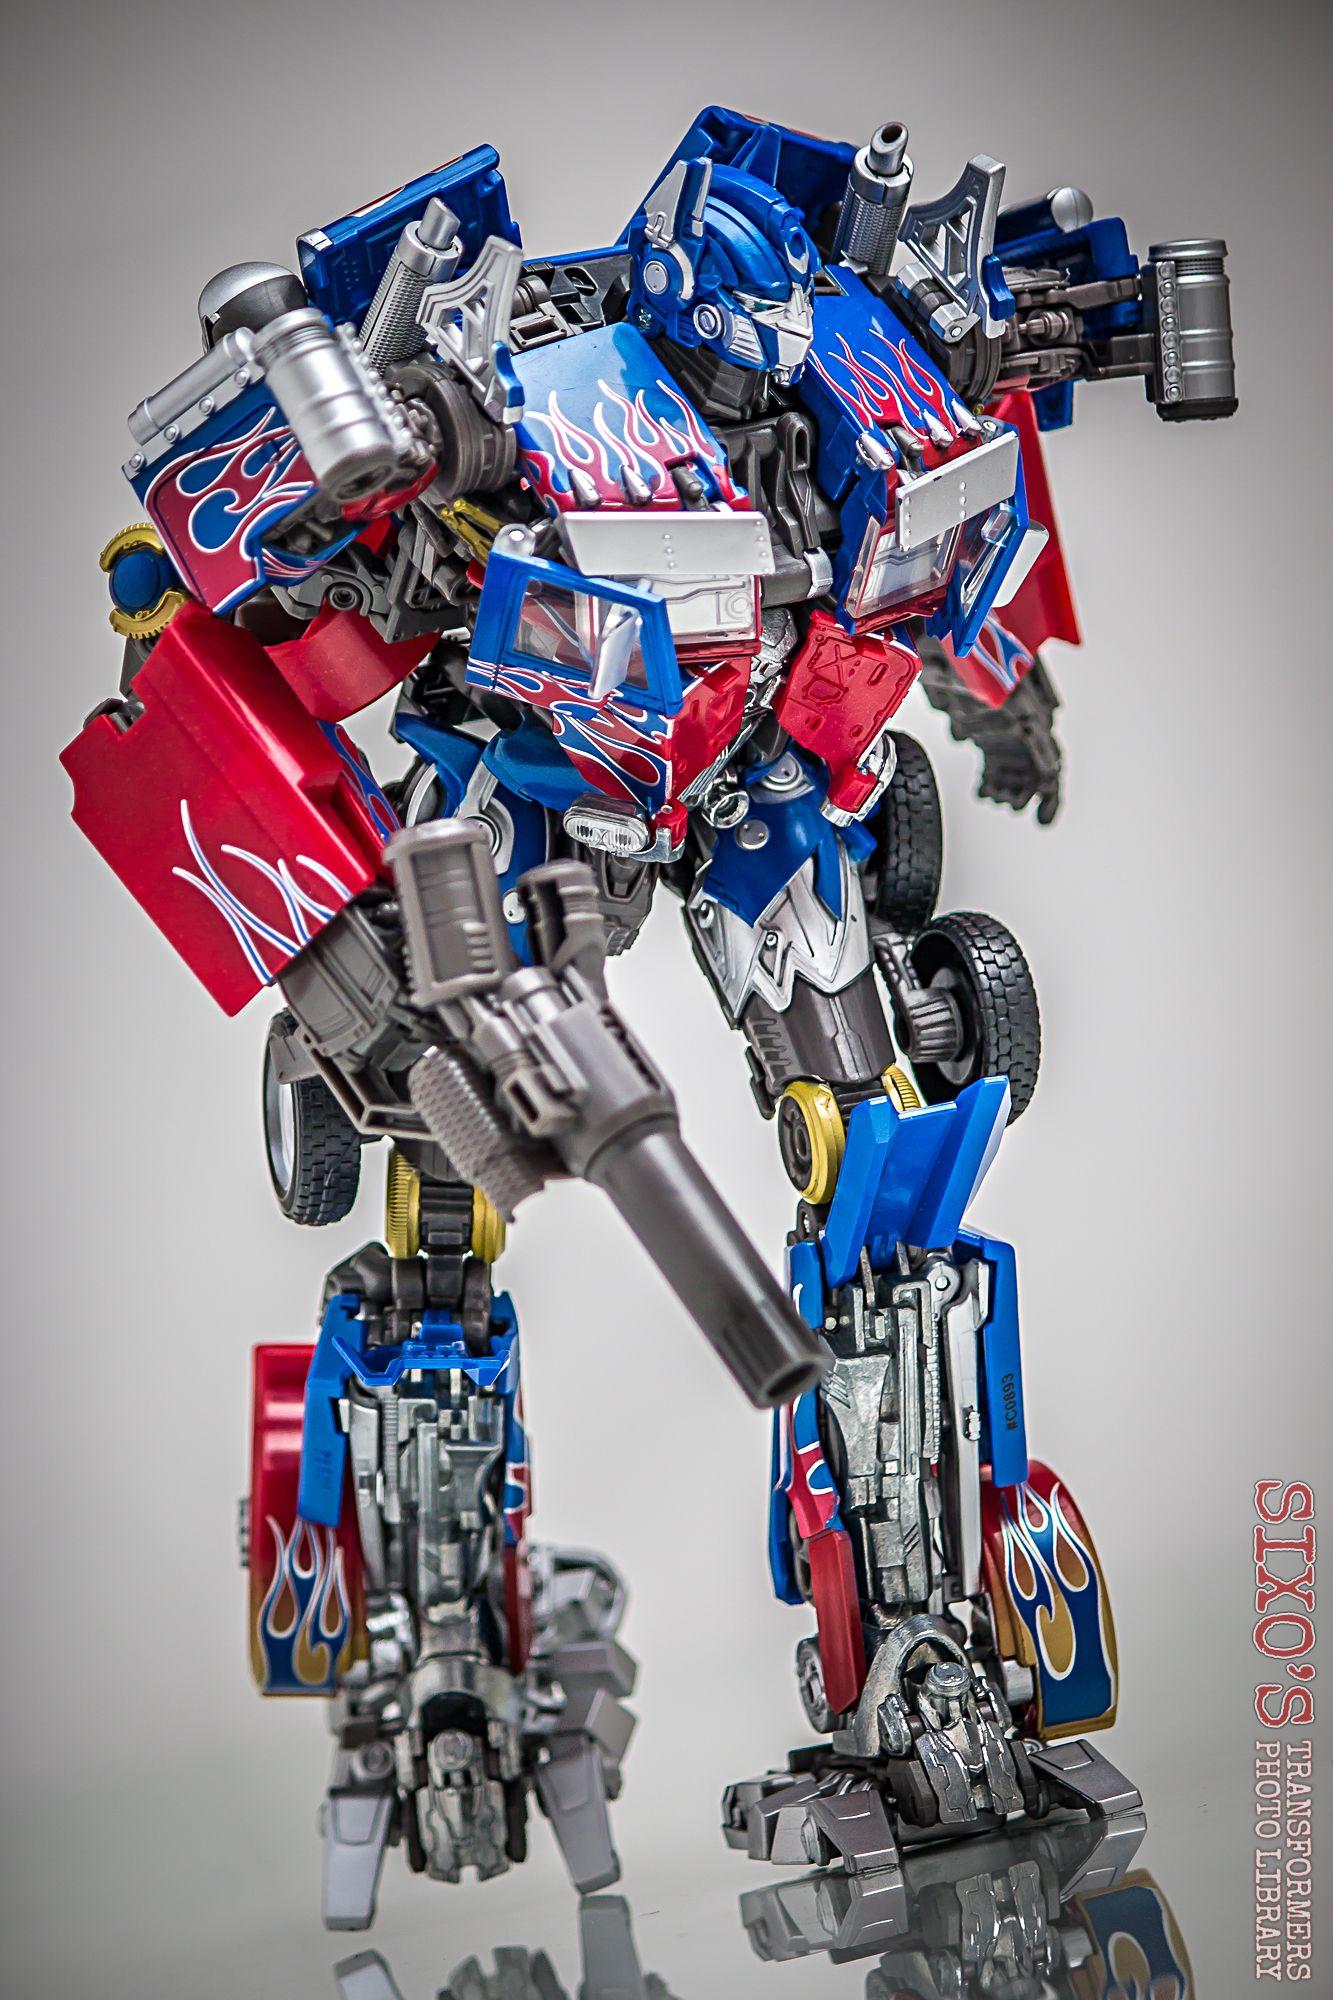 TAKARA-Transformers-Masterpiece-Movie-Series-MPM-04-OPTIMUS-PRIME-mpm-4-figure